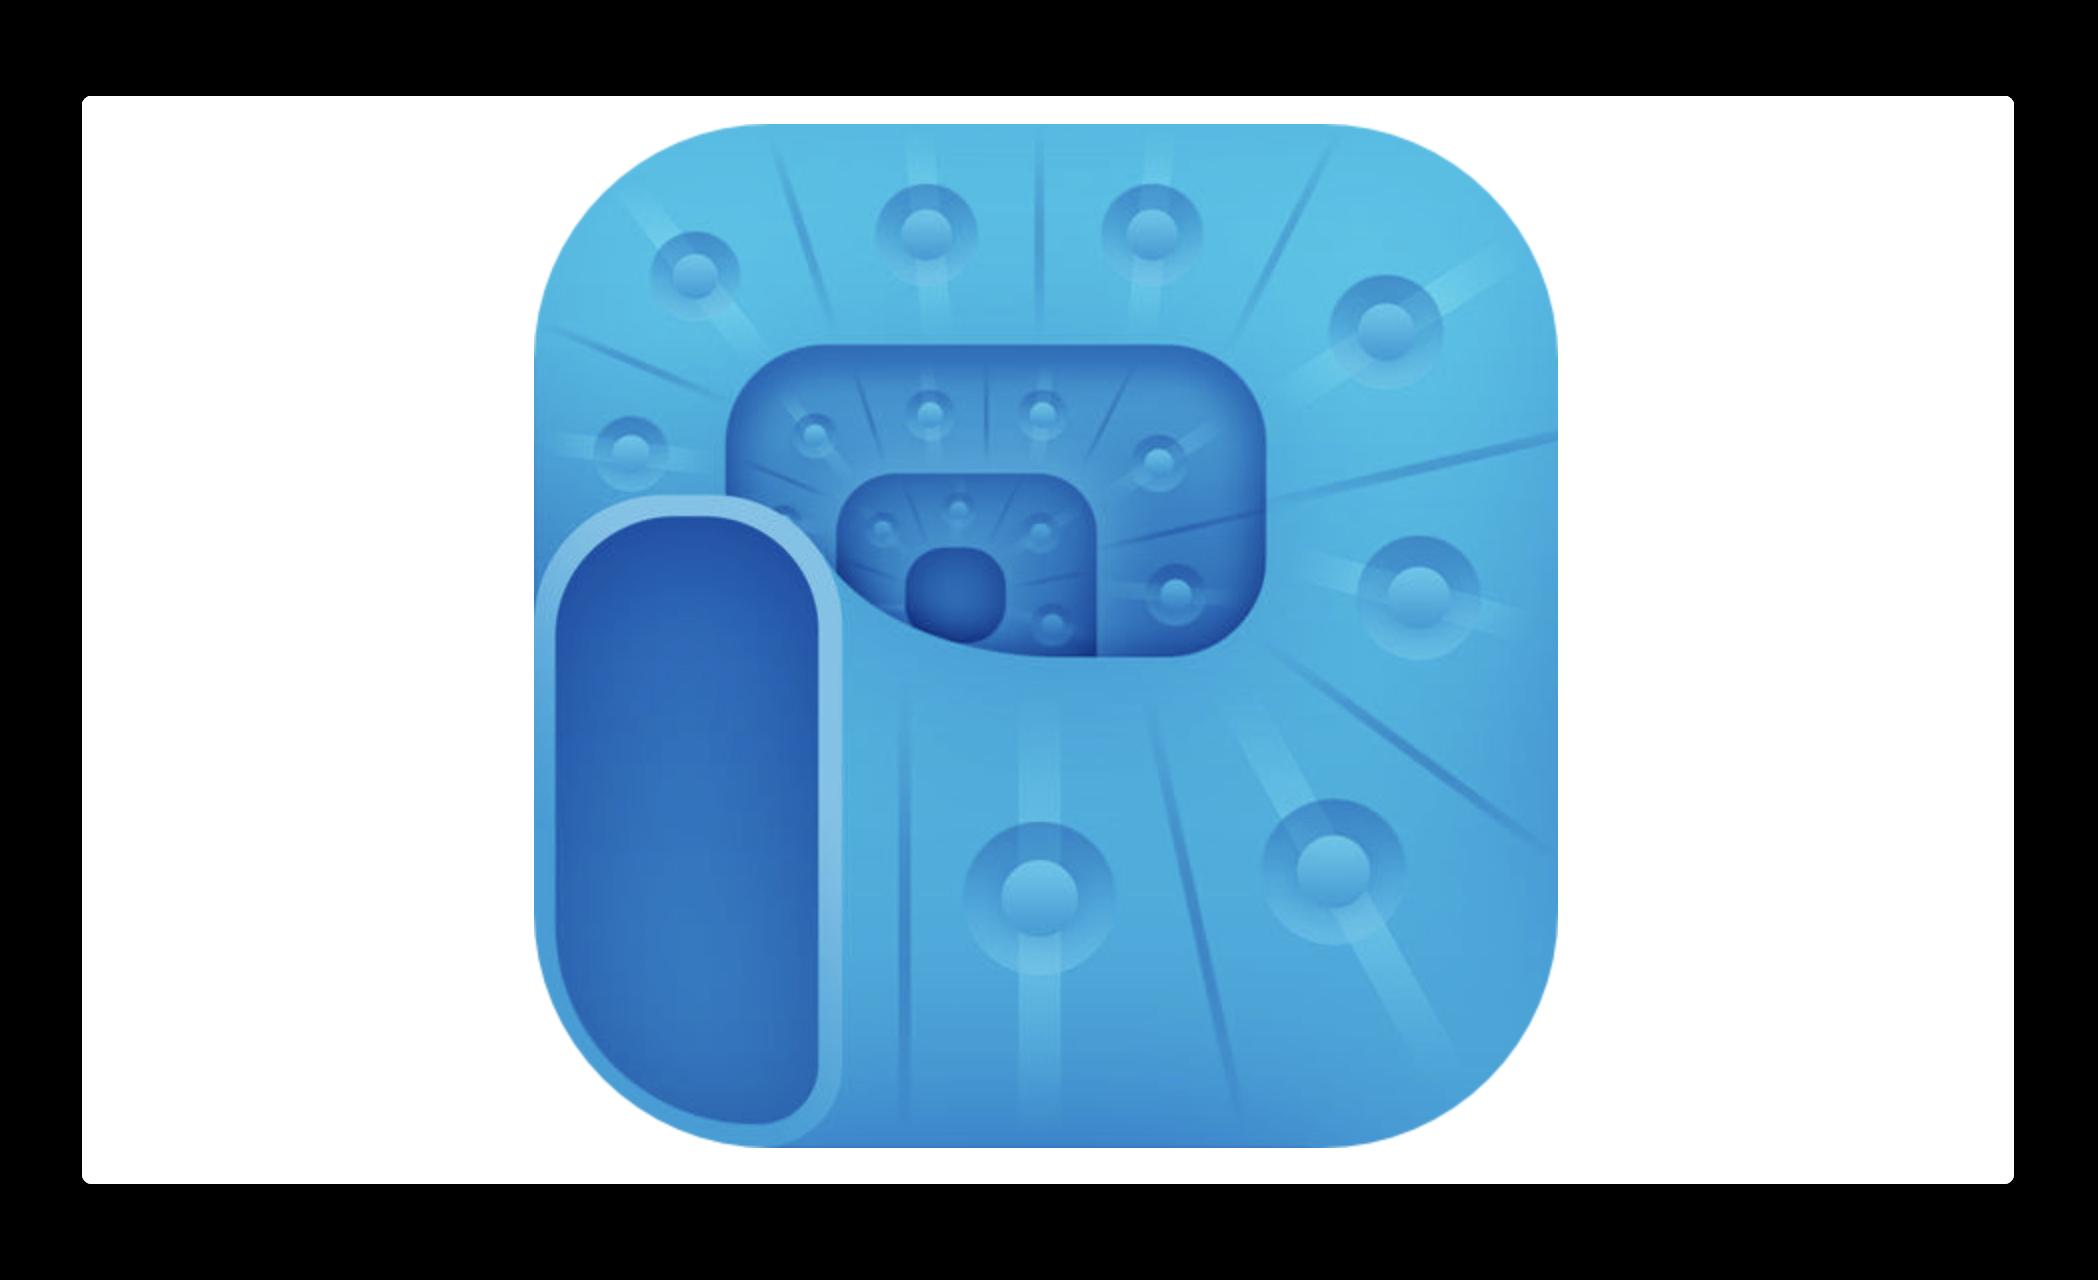 【iOS】「DEVONthink To Go 2.4.4」リリースで、編集がより簡単に